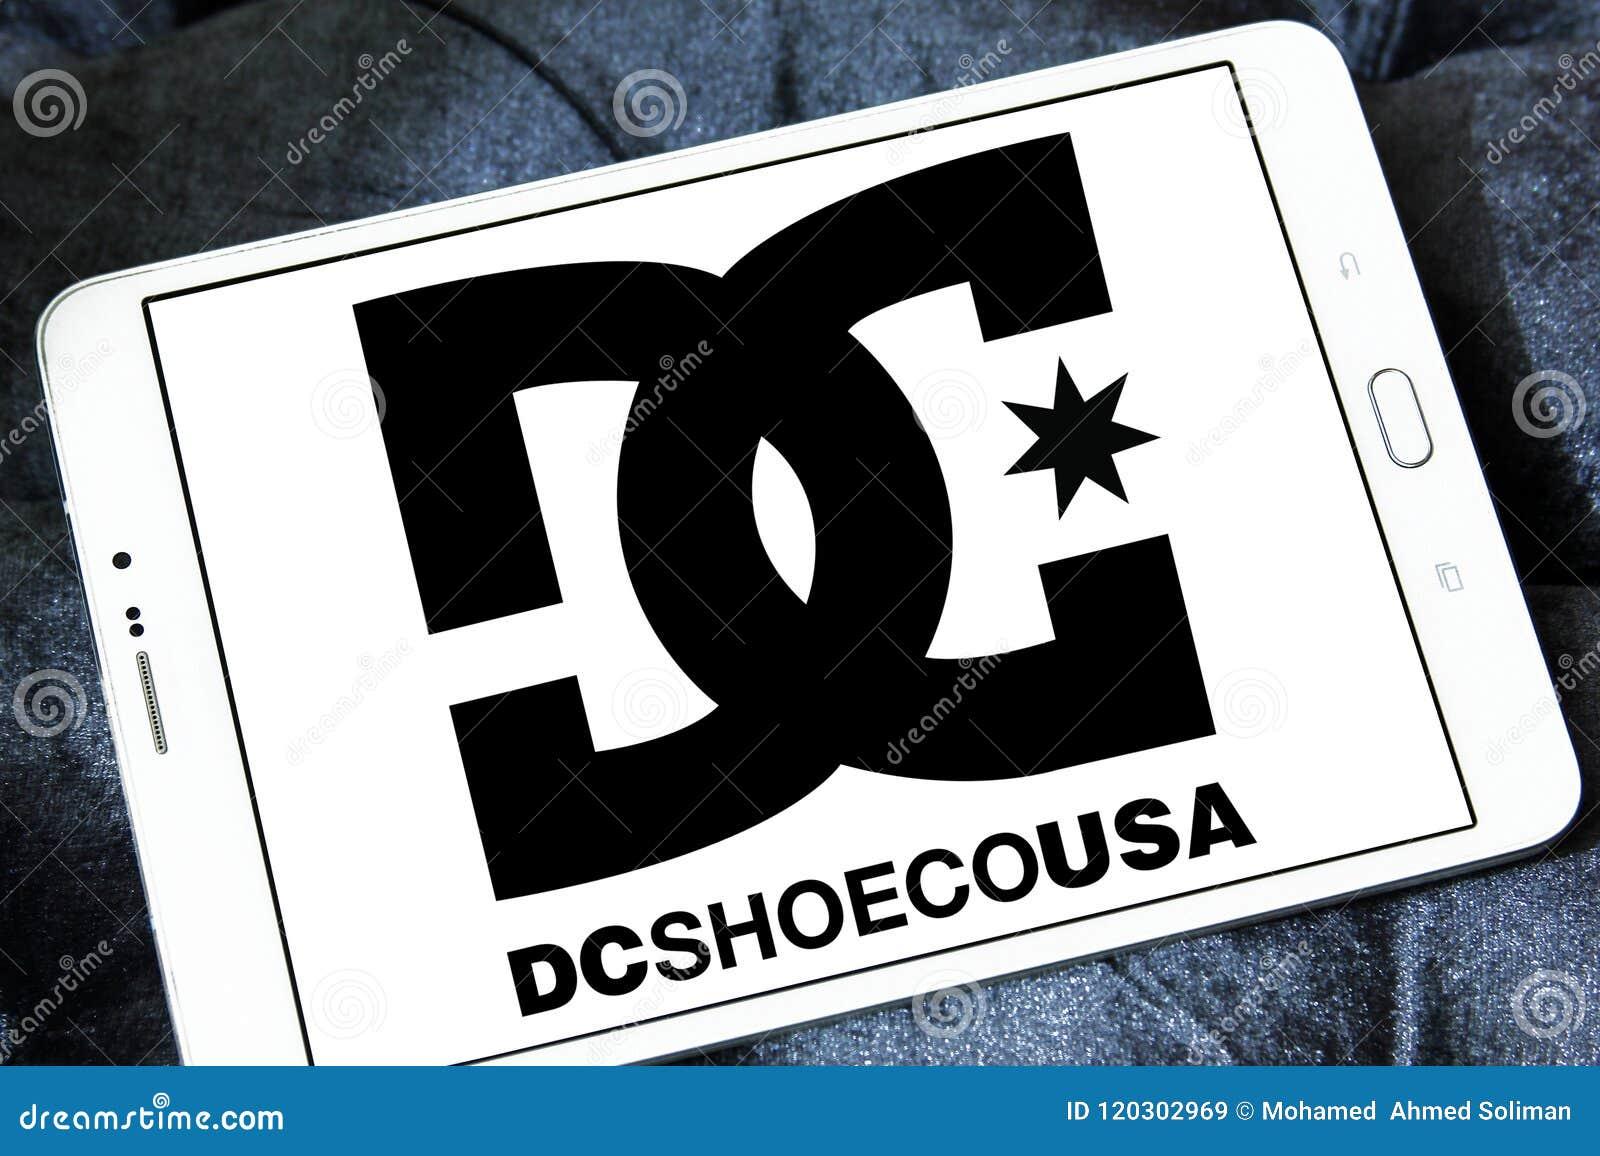 DC Shoes Clothing Company Logo Editorial Stock Image - Image of ... ae2c77cc0